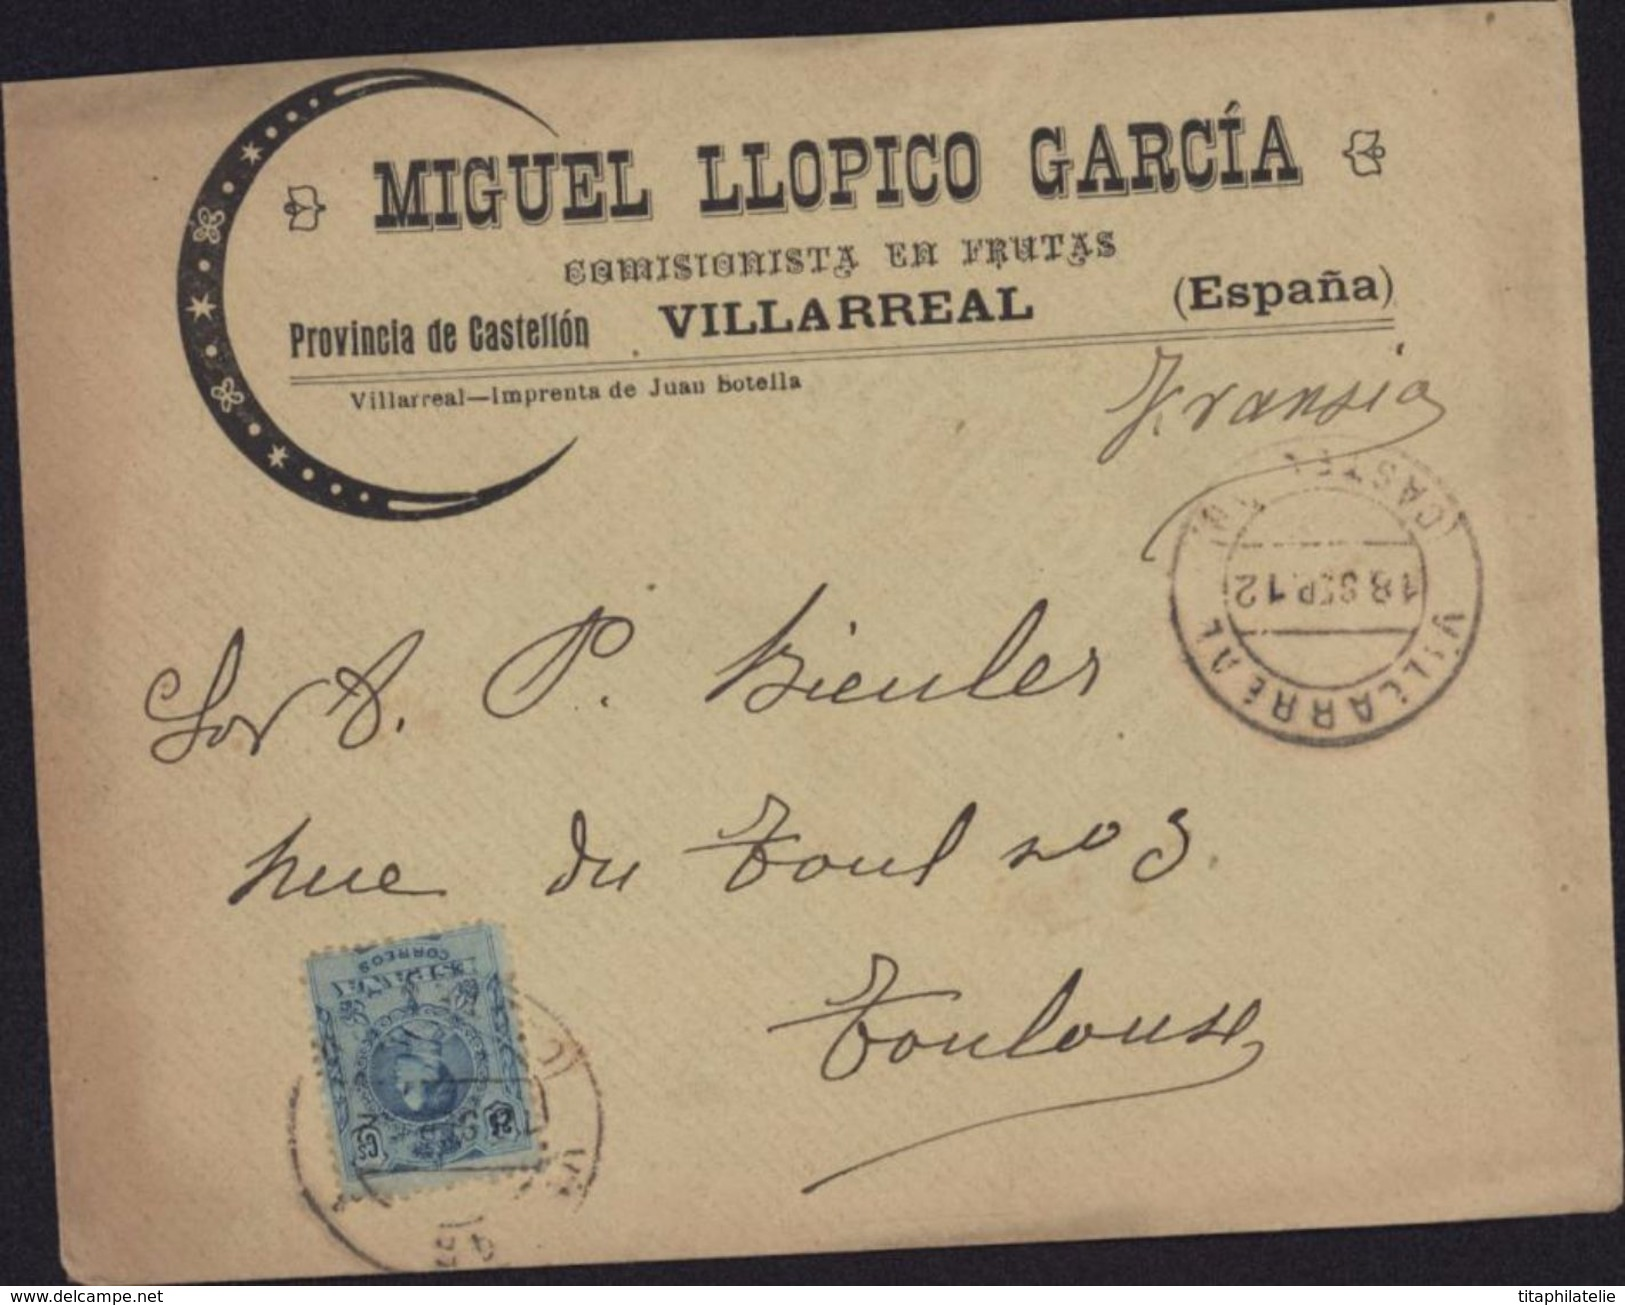 Enveloppe Illustrée Miguel Llopico Garcia Comisionista En Frutas Villarreal Espana Castellon YT 248 18 Sept 12 - 1889-1931 Royaume: Alphonse XIII